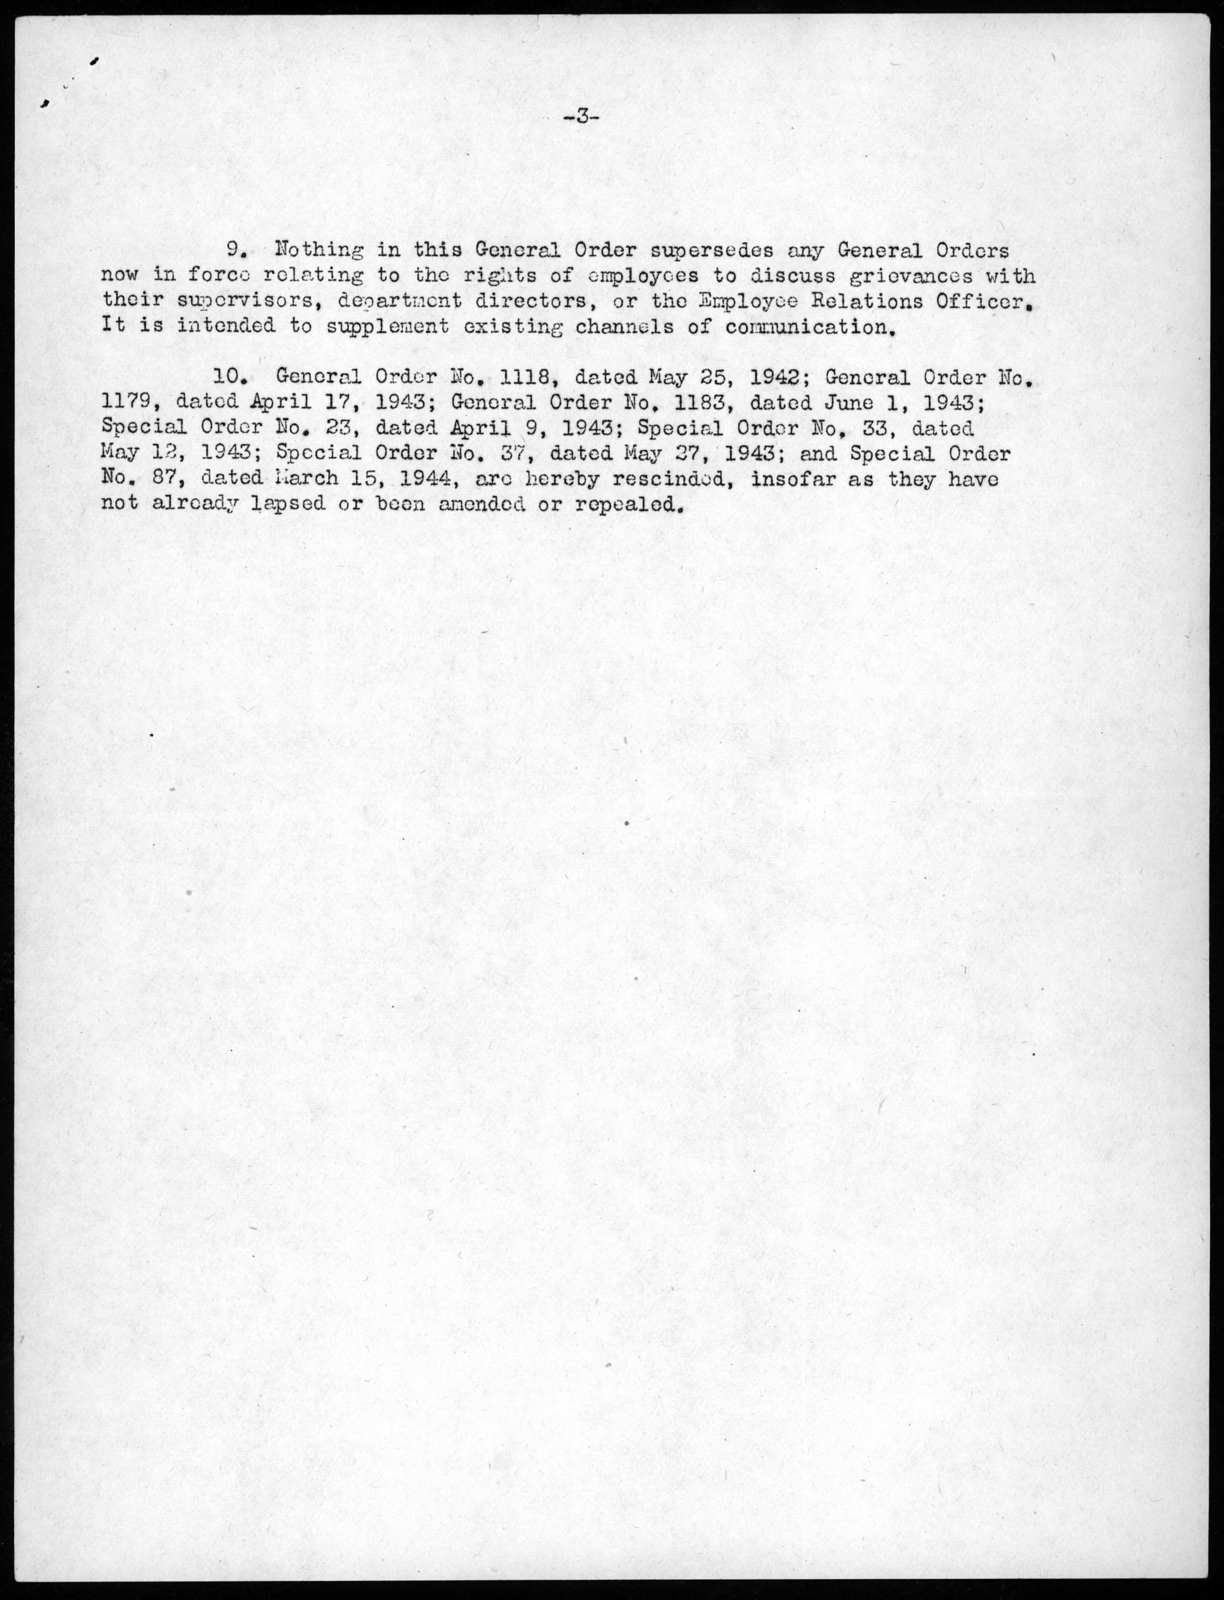 General Order No. 1308, Librarian of Congress, Library of Congress, December 5, 1946